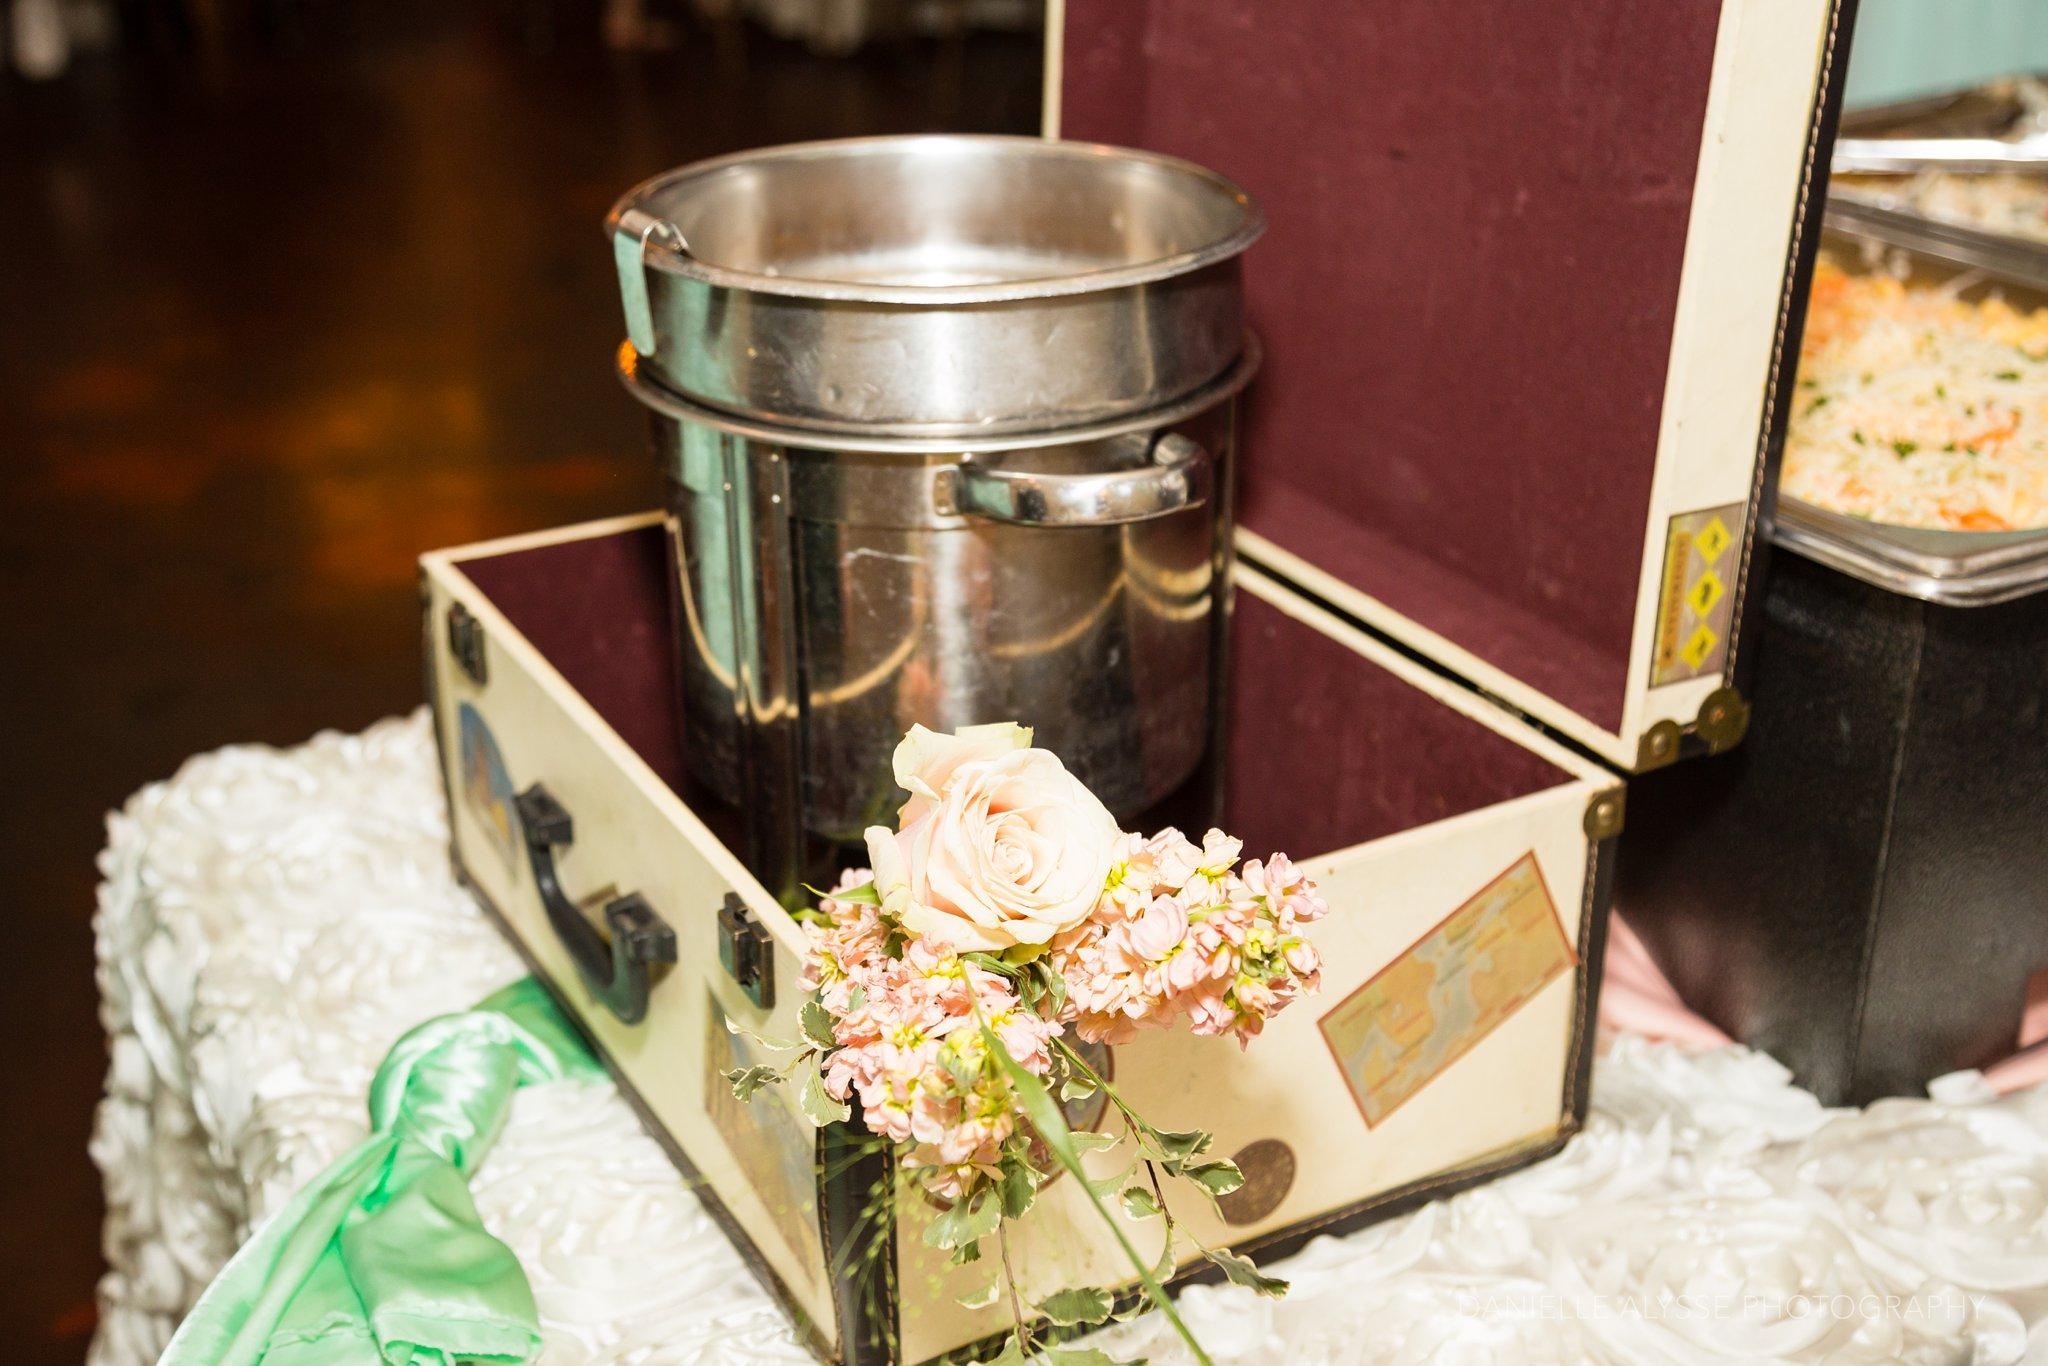 170507_blog_megan_david_wedding_loomis_flower_farm_inn_danielle_alysse_photography_sacramento_photographer0491_WEB.jpg